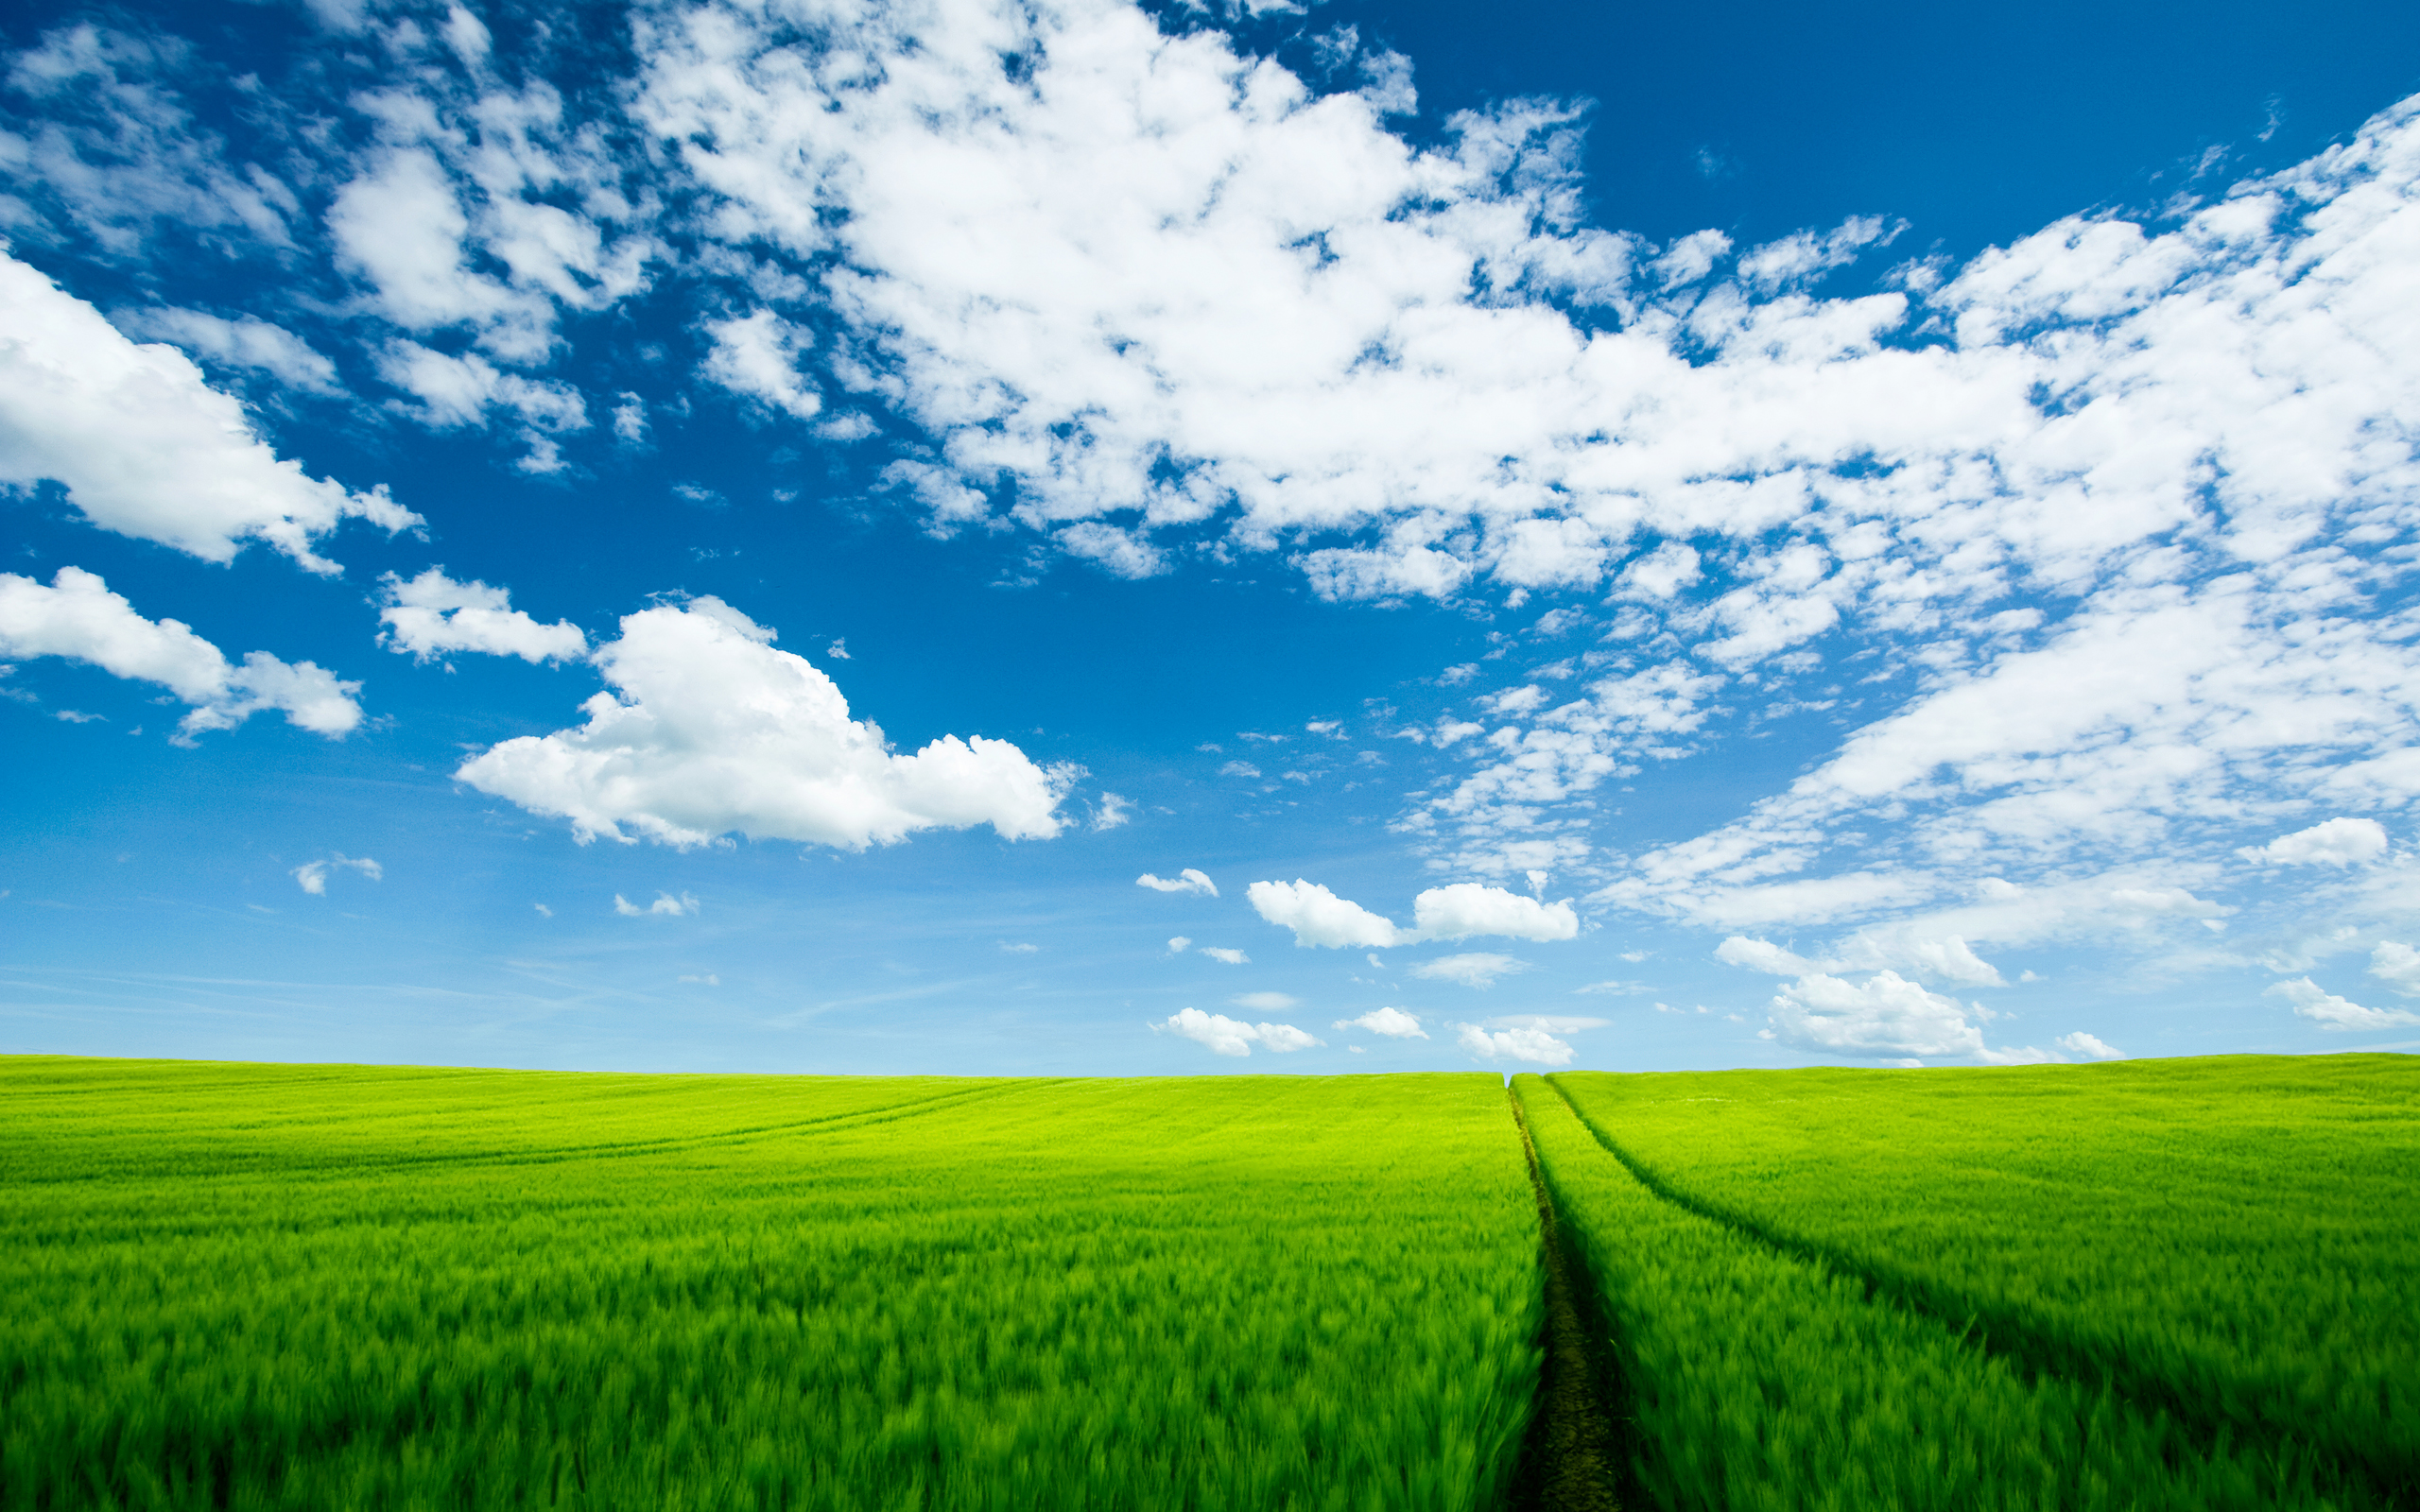 Landscape Pictures for Wallpaper - WallpaperSafari